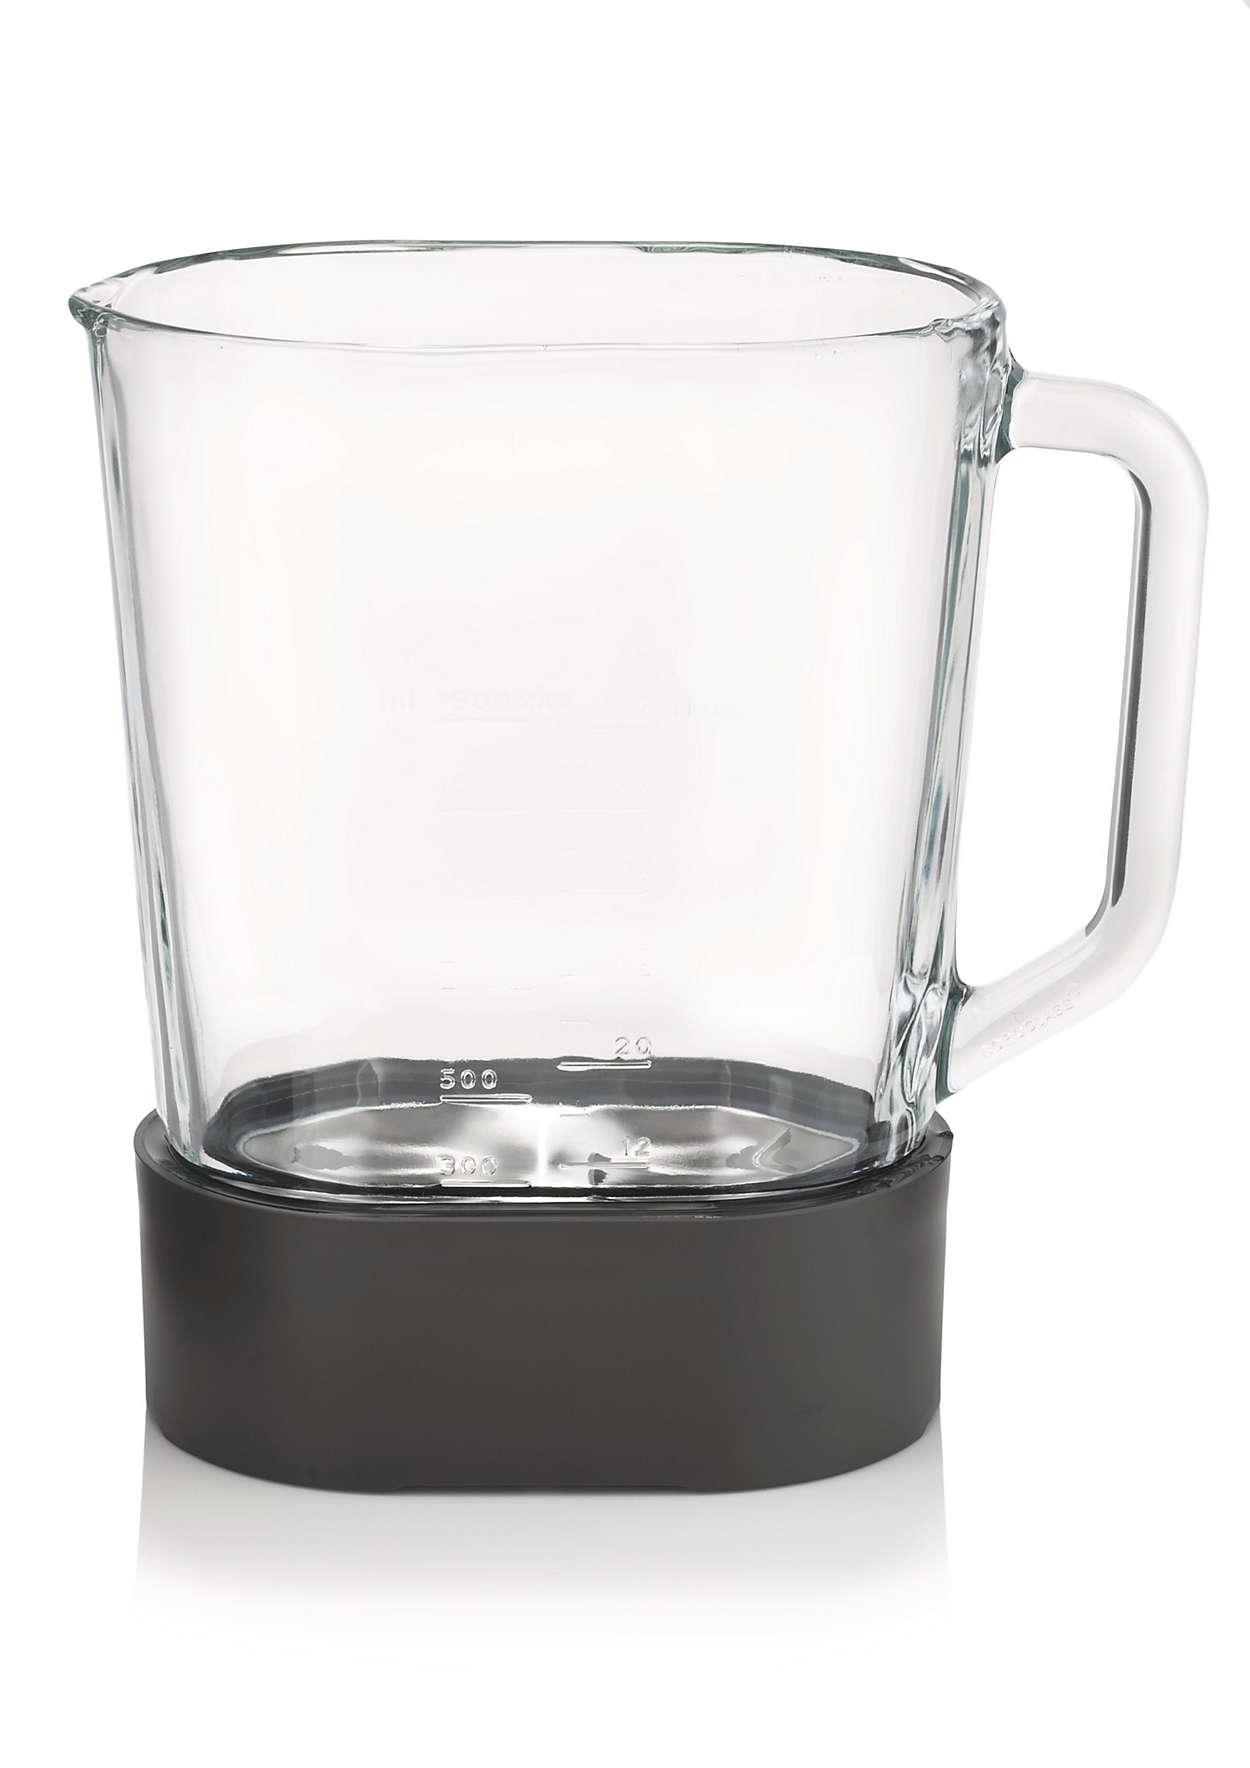 Bol en verre pour blender